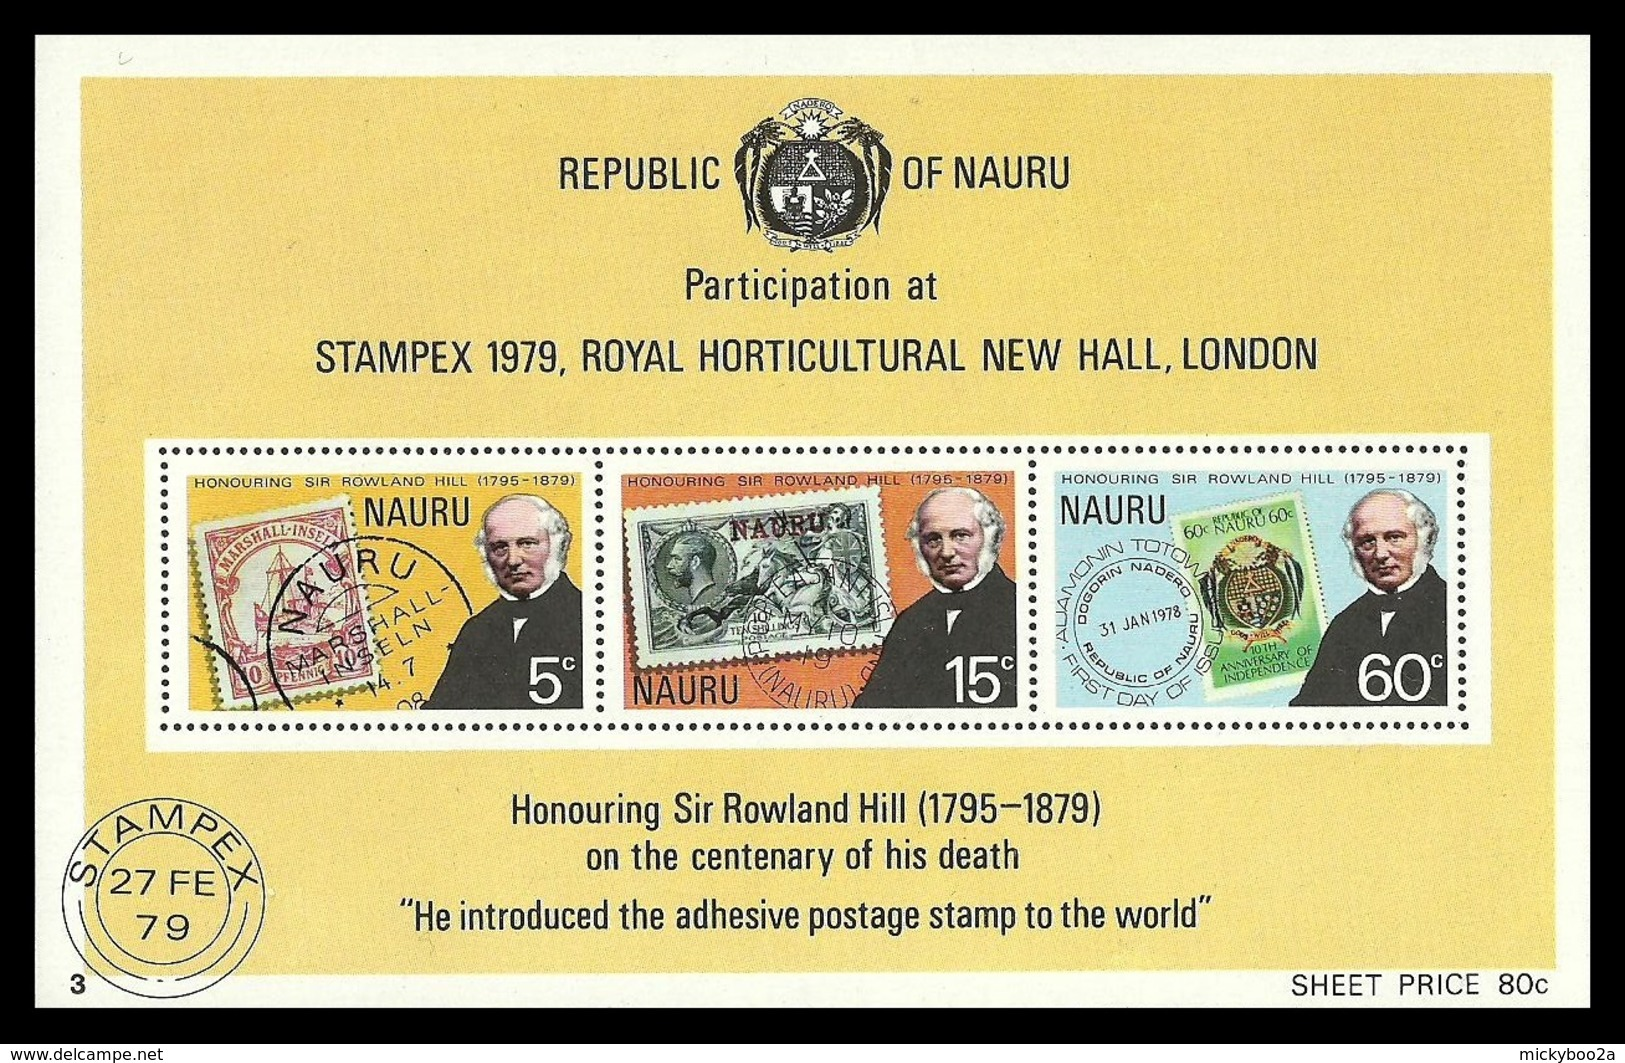 NAURU 1979 ROWLAND HILL OMNIBUS SHIPS HORSES STAMPEX M/SHEET MNH - Nauru